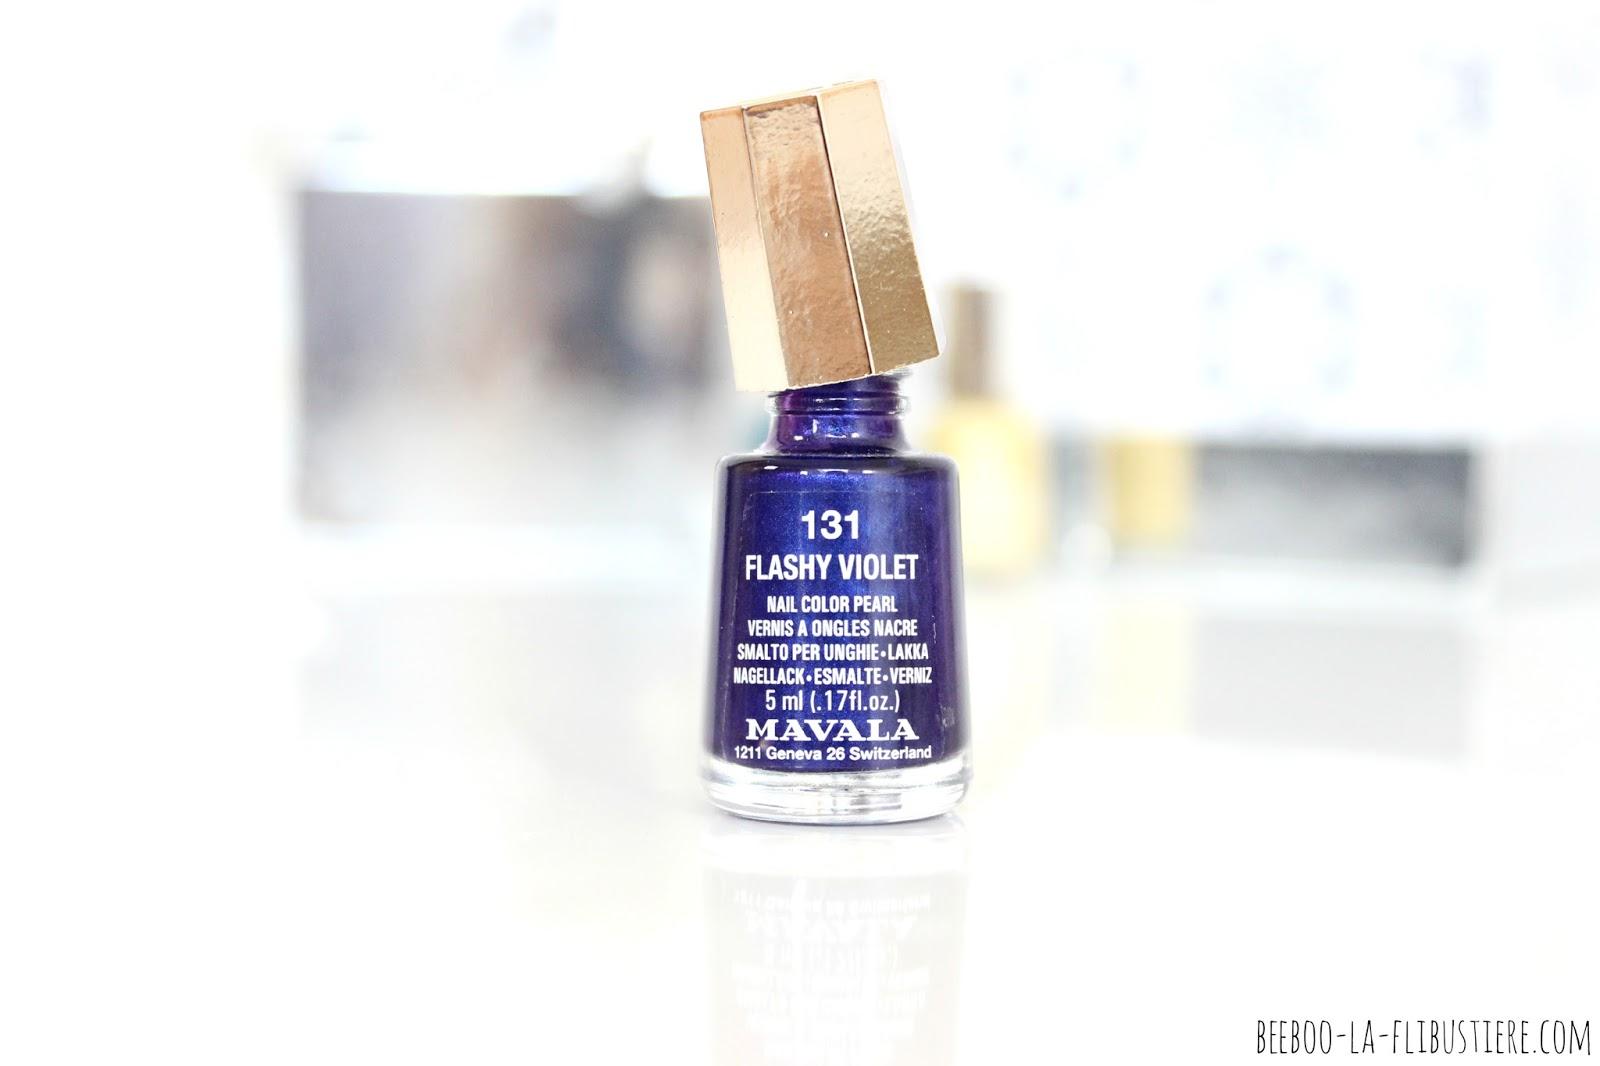 vernis n°131 flashy violet mavala